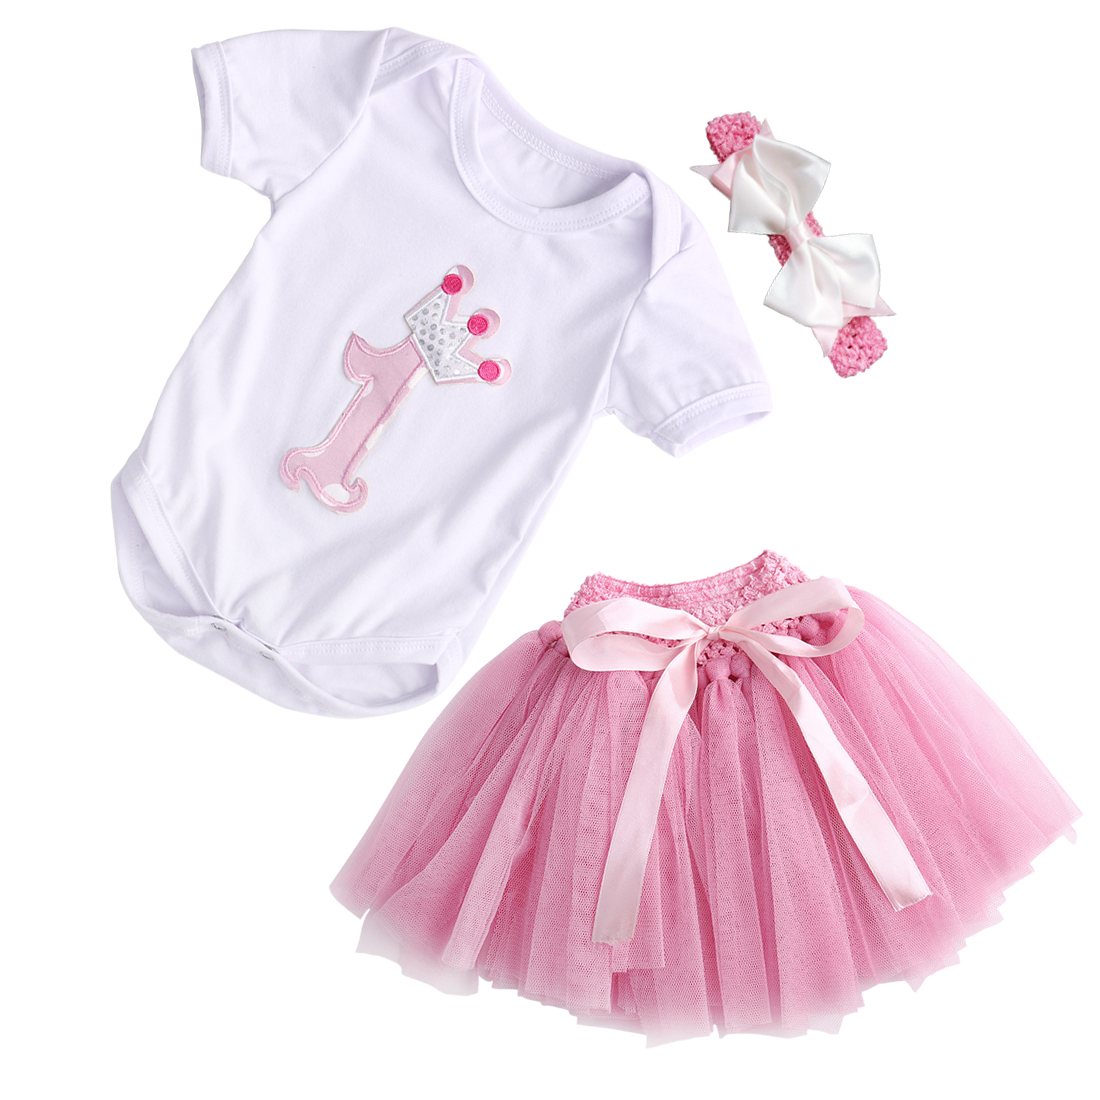 2016 New Baby Girls Summer Dress kids 1st Crown Romper Headband Birthday Tutu Dress Outfit 3pcs